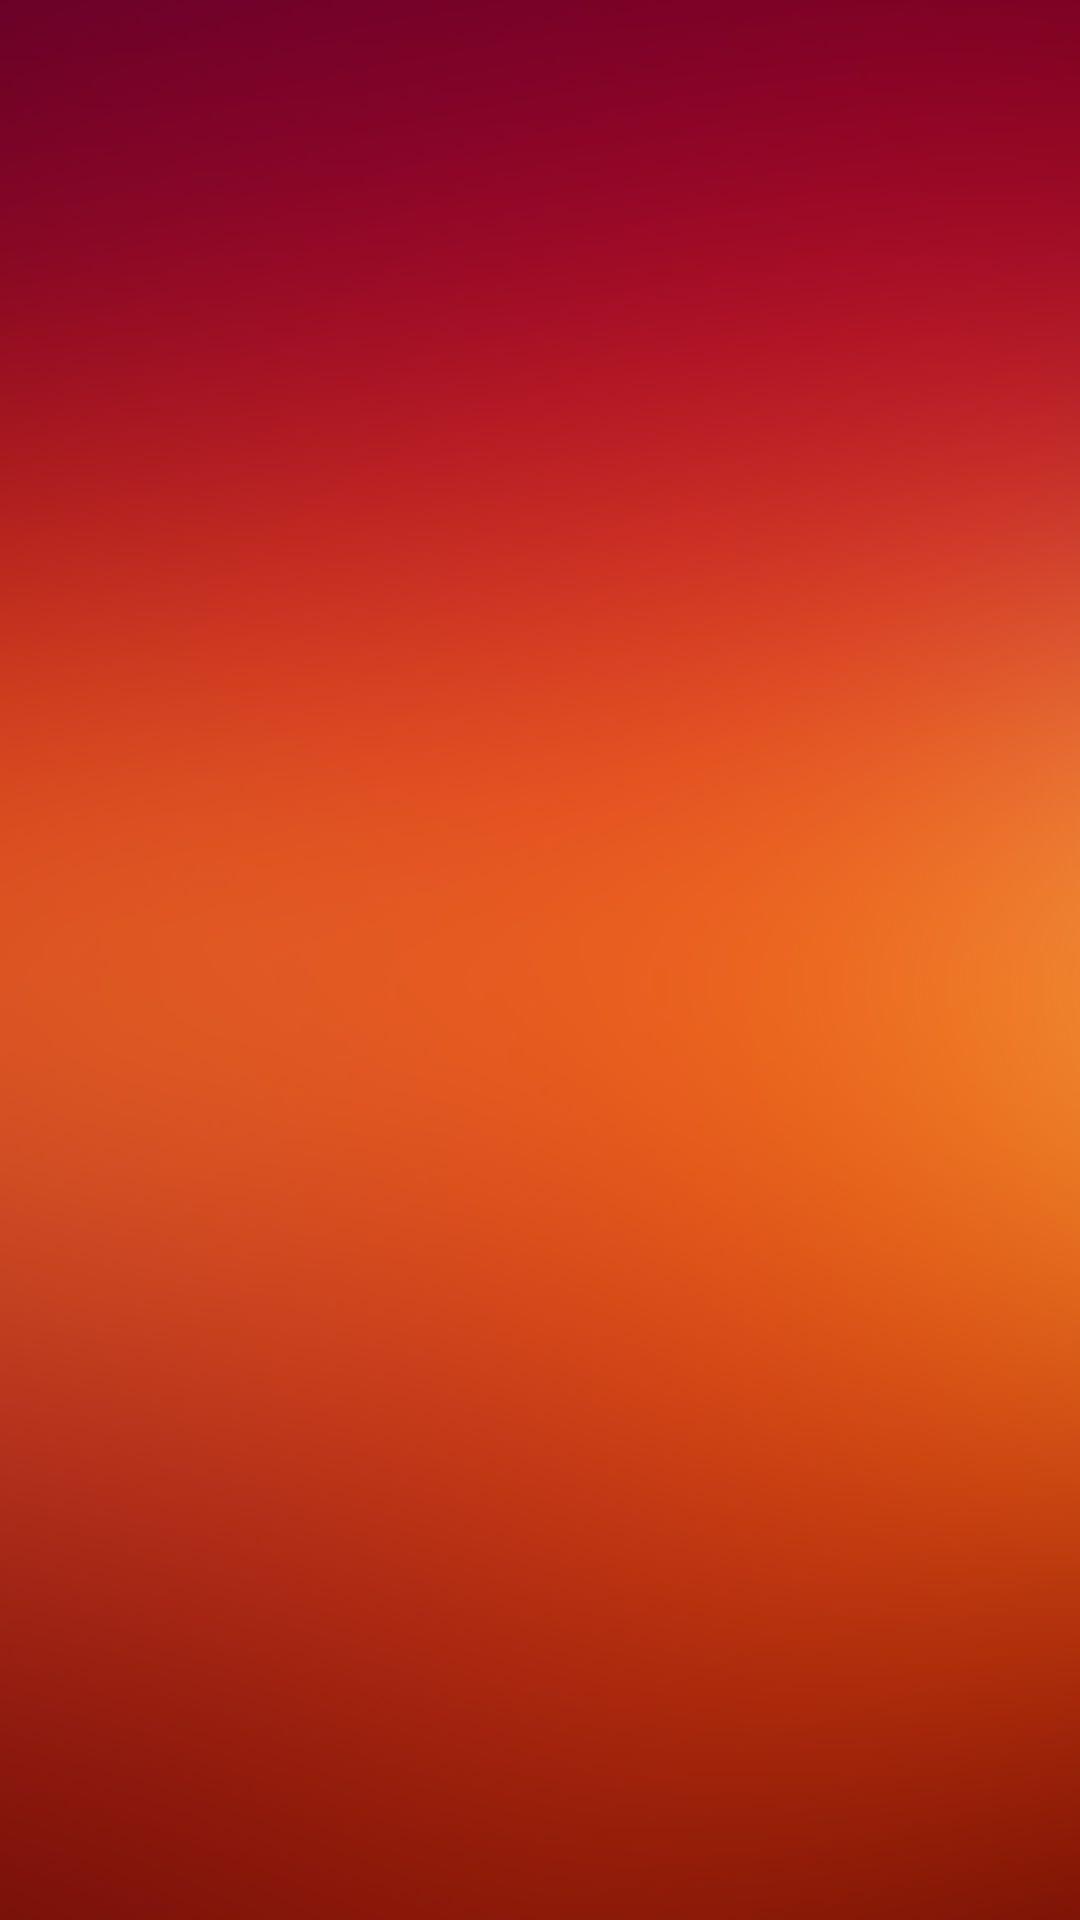 模様赤橙 スマホ壁紙 Sfondi Iphone Sfondi